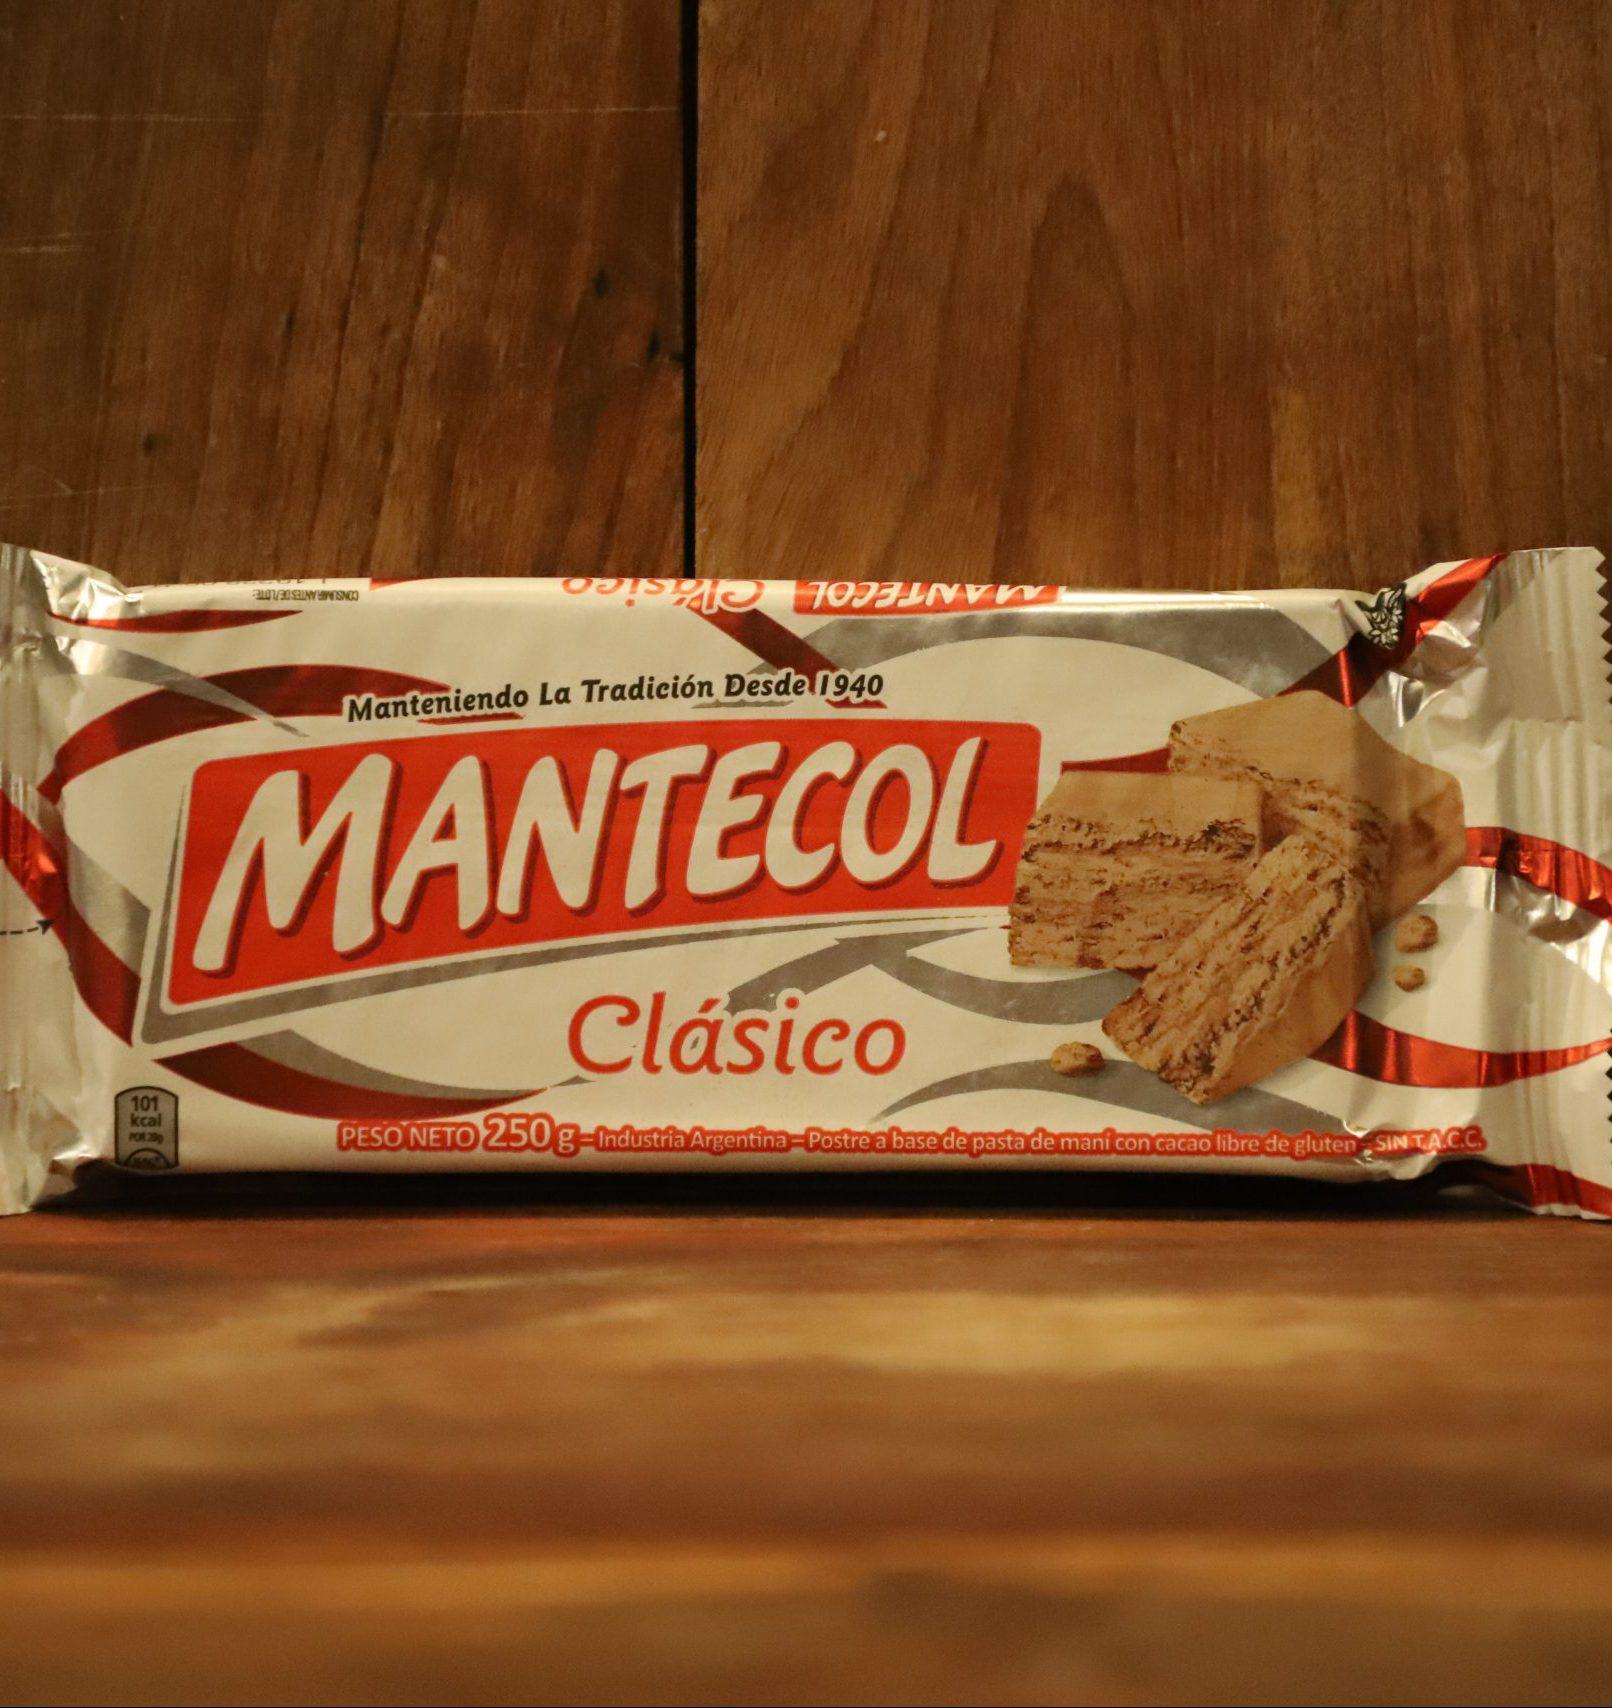 MANTECOL 250g